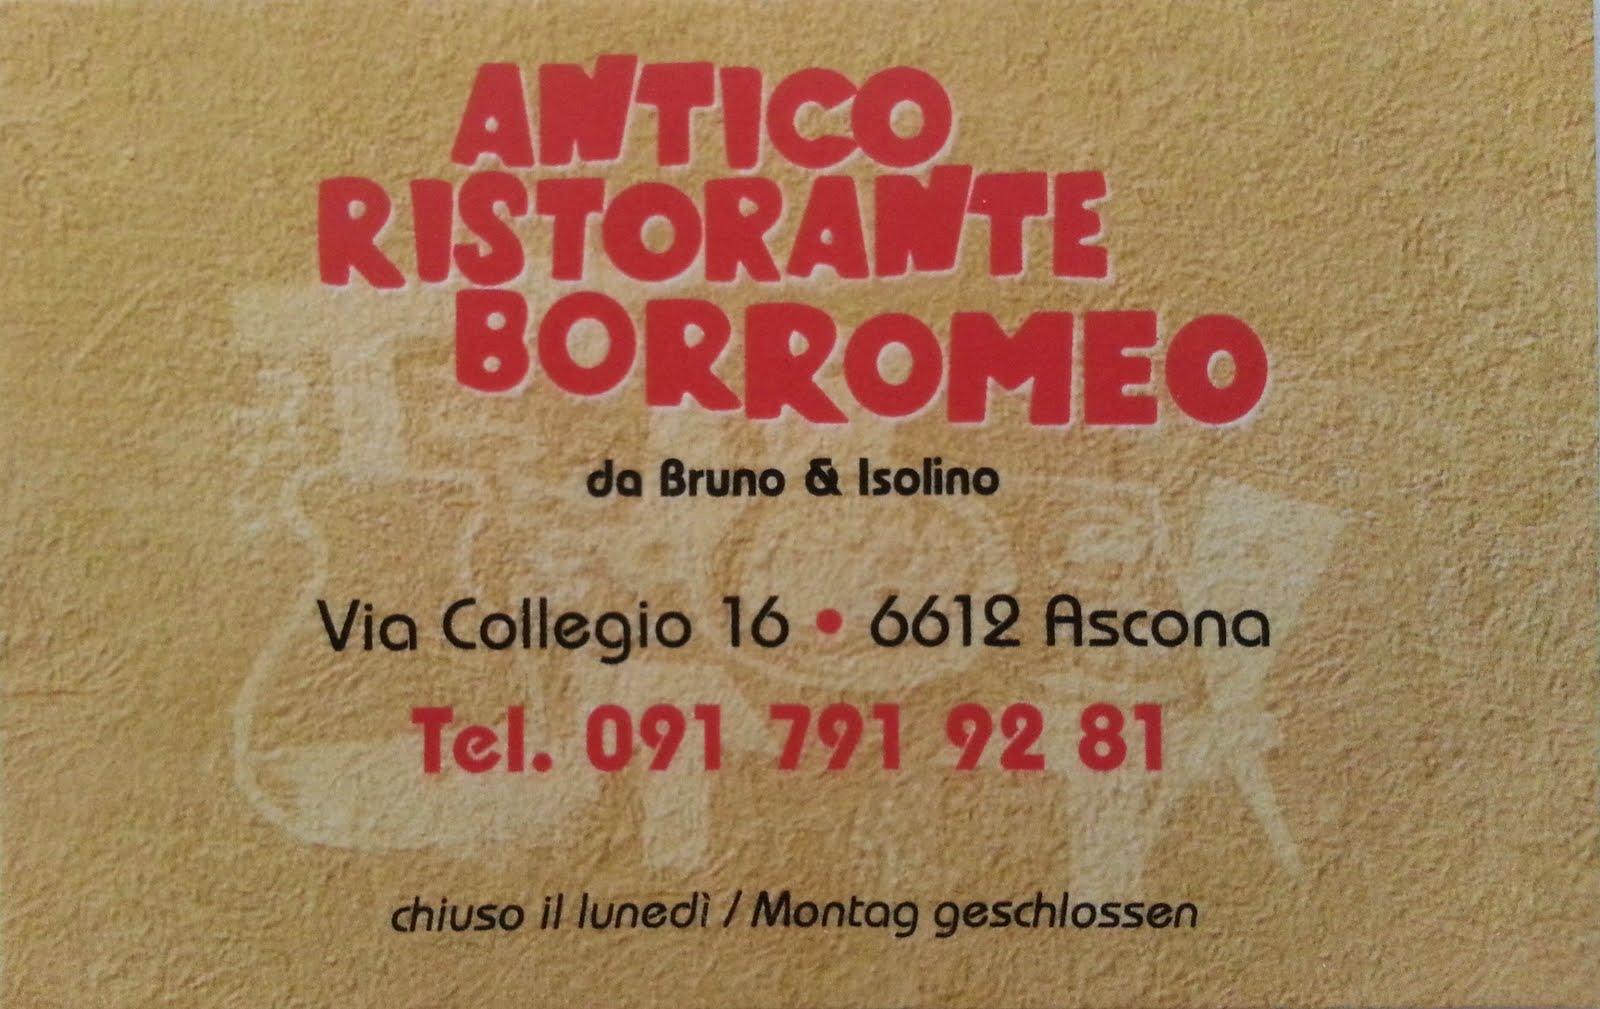 Borromeo